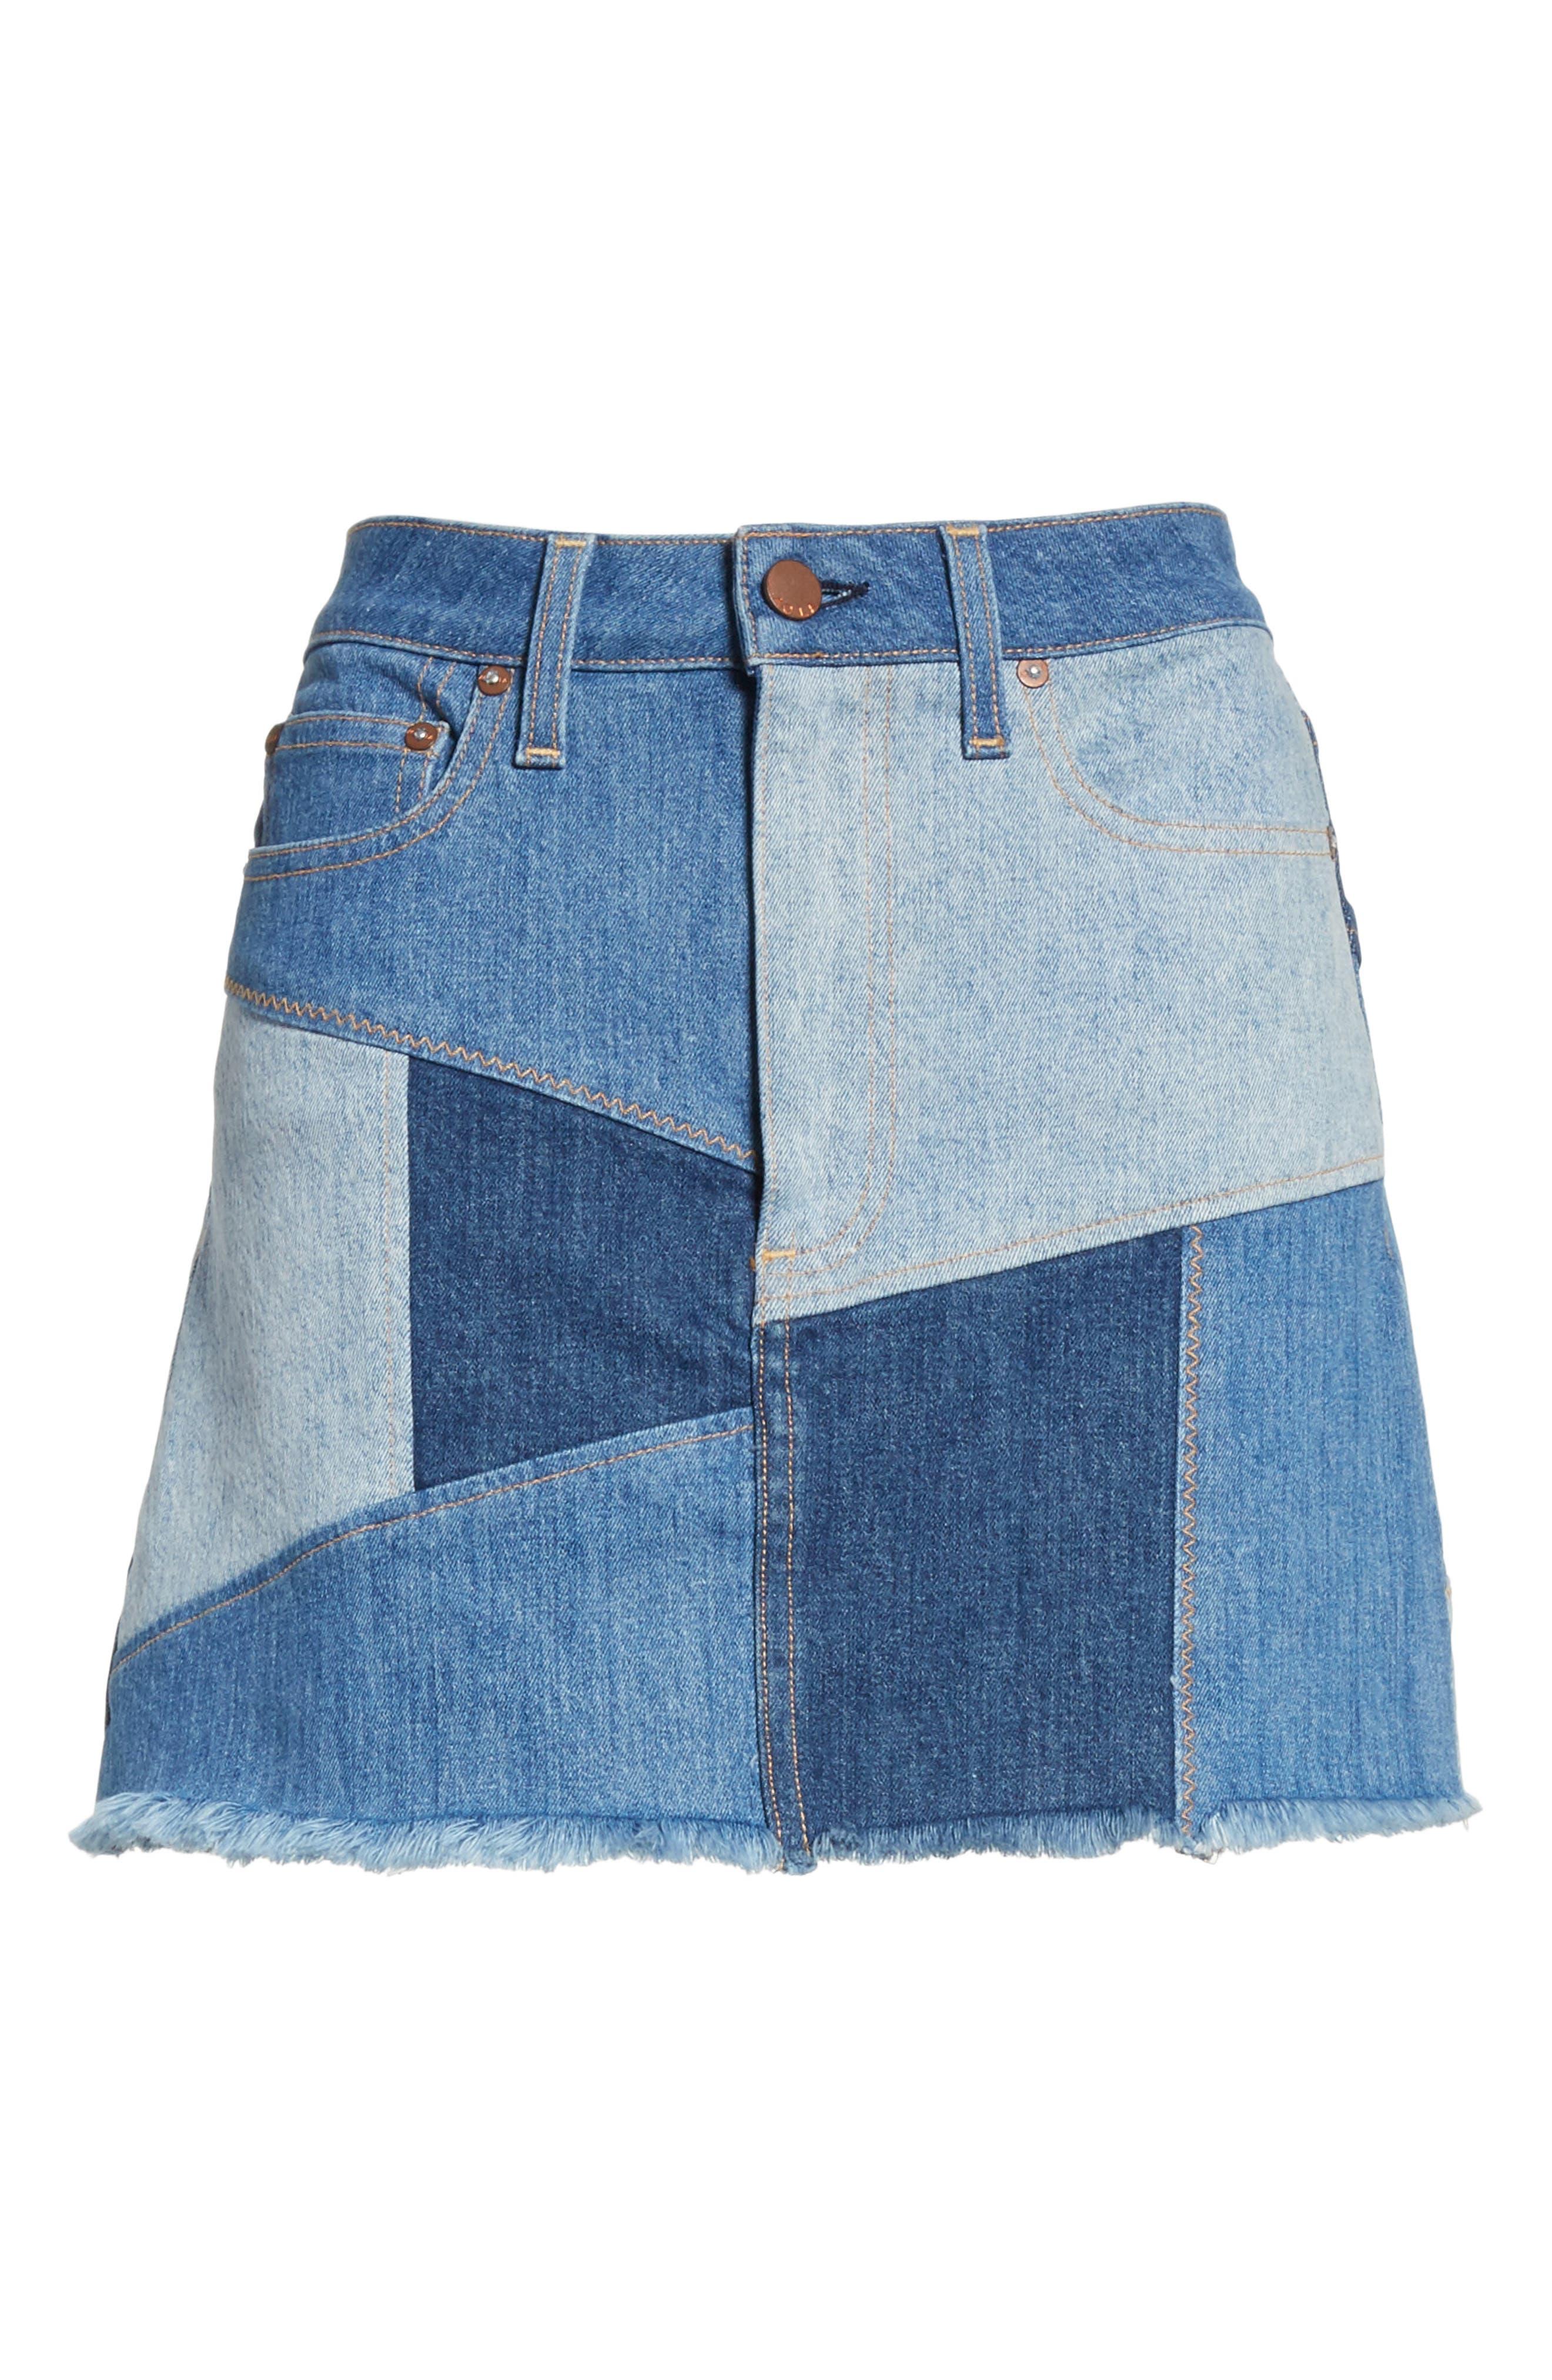 AO.LA Patchwork Denim Miniskirt,                             Alternate thumbnail 6, color,                             Keep Steppin